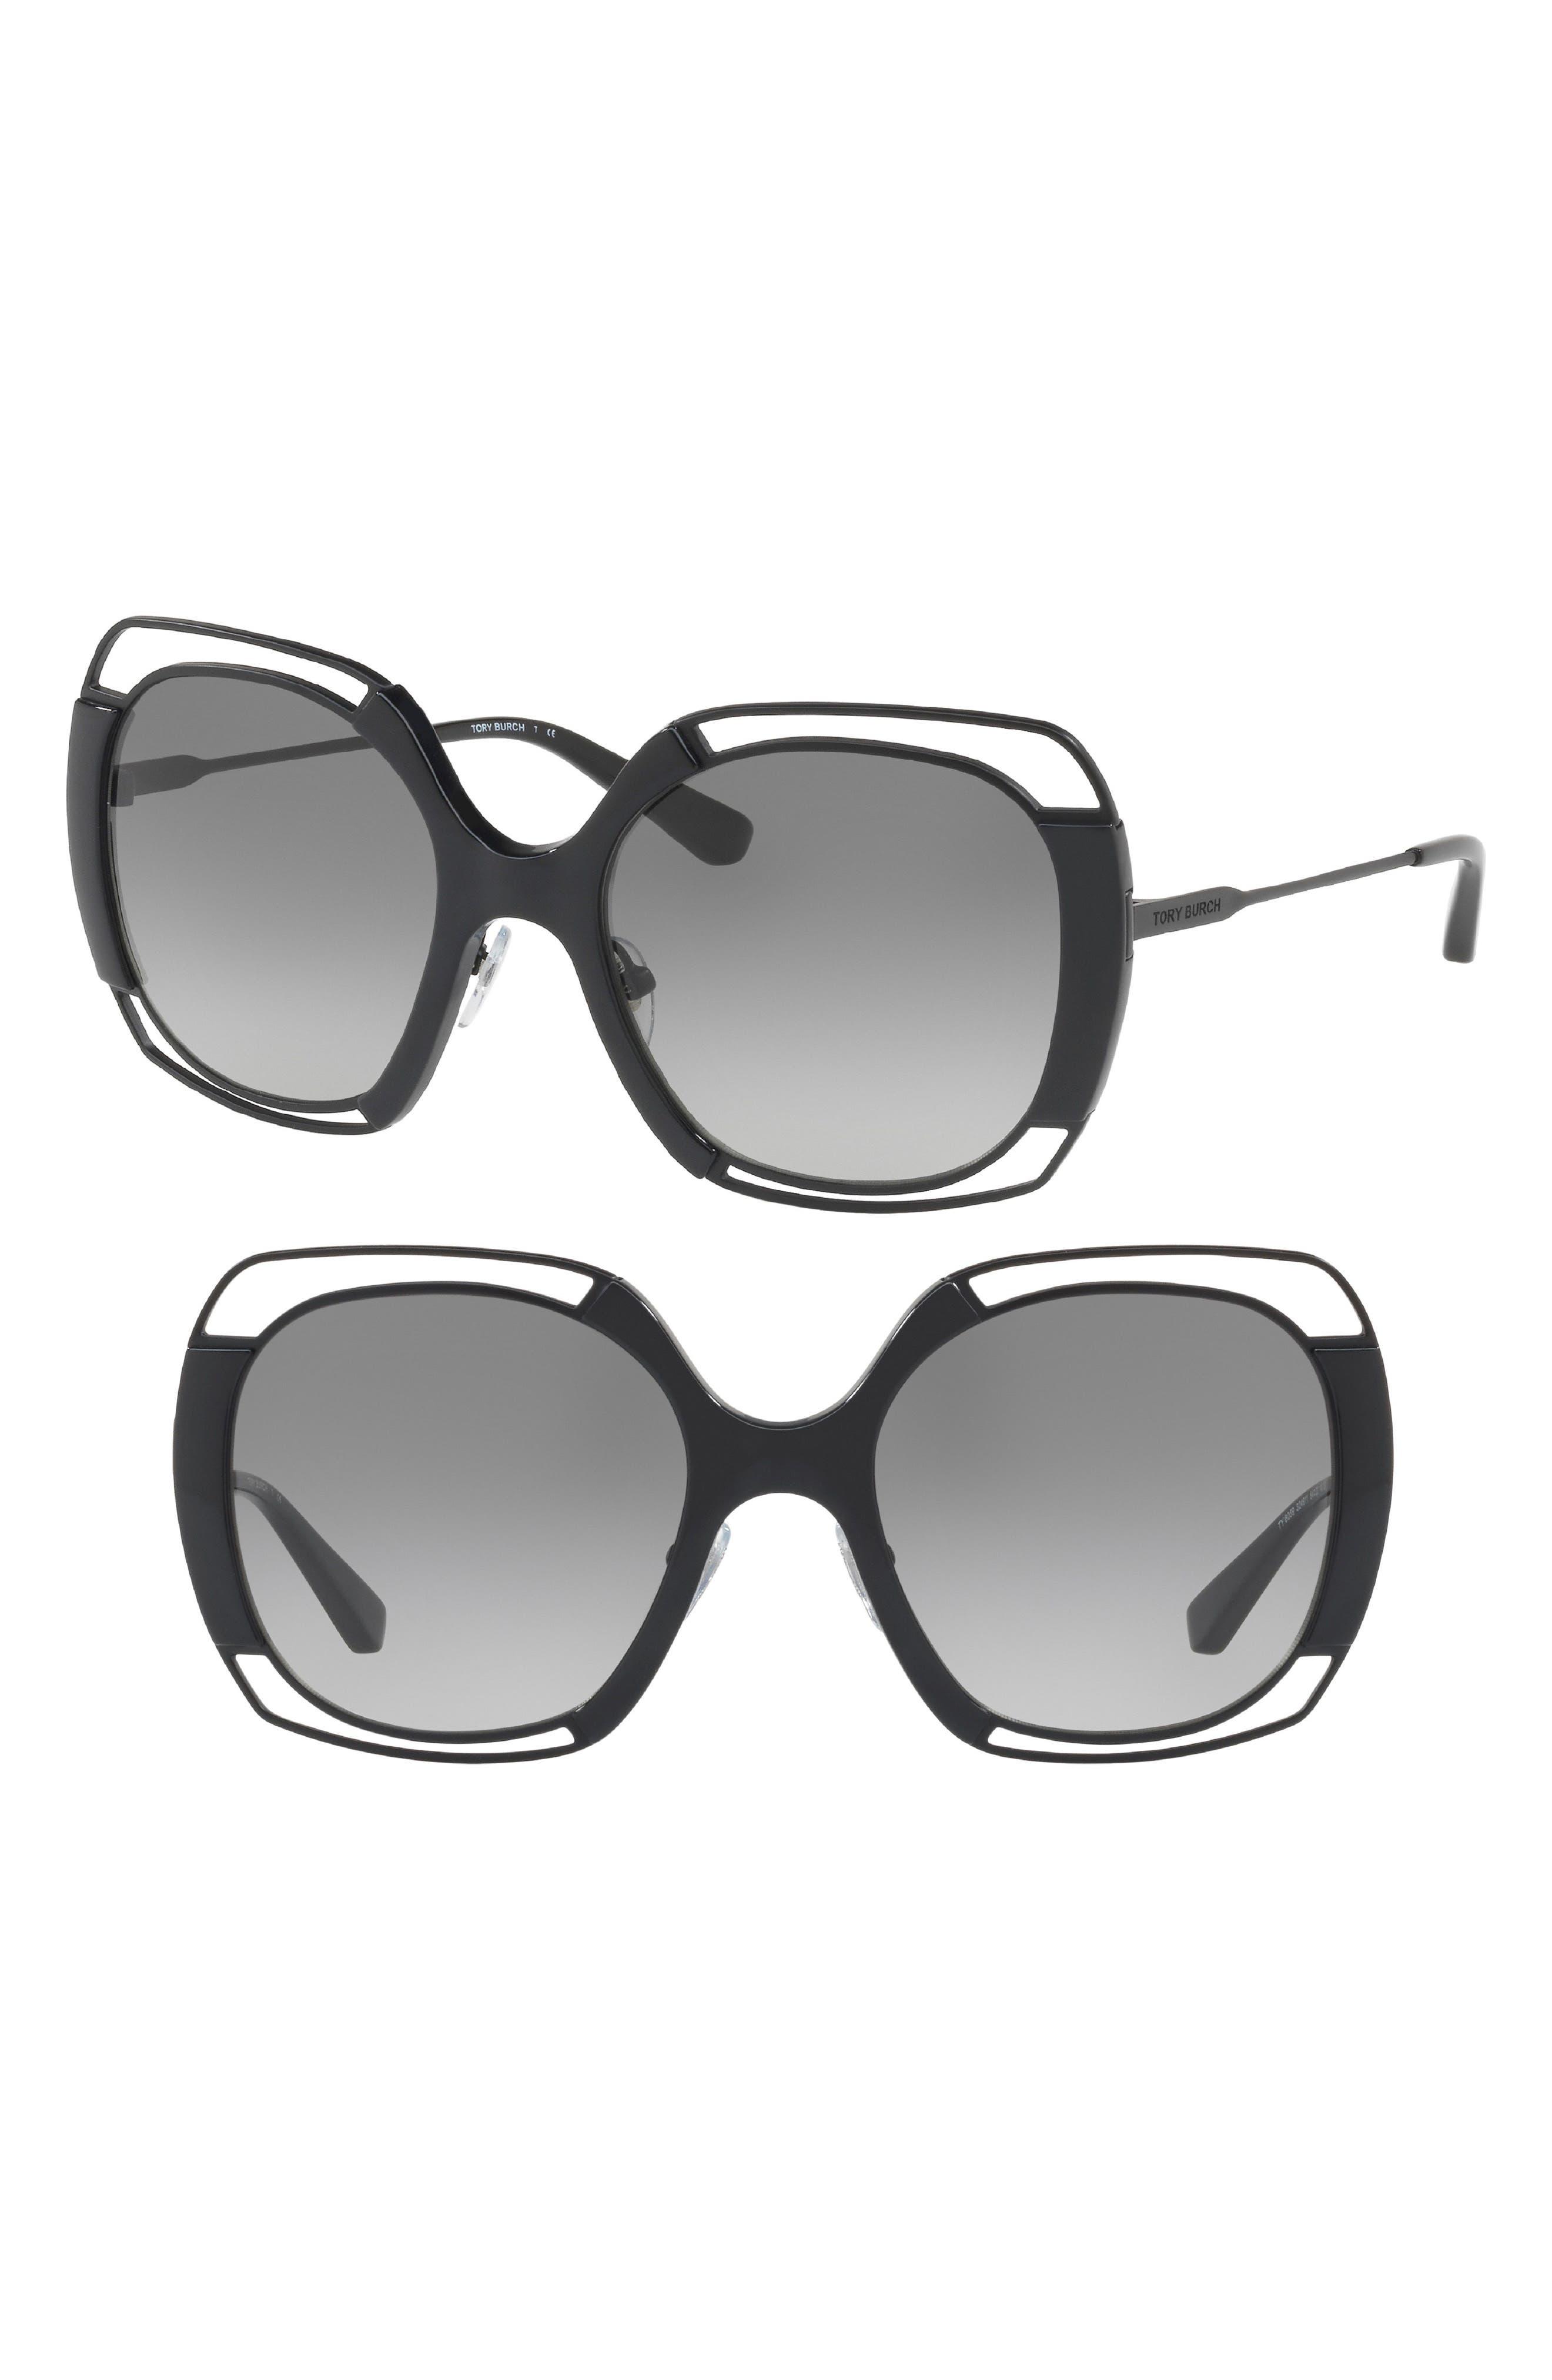 Main Image - Tory Burch 54mm Square Gradient Sunglasses